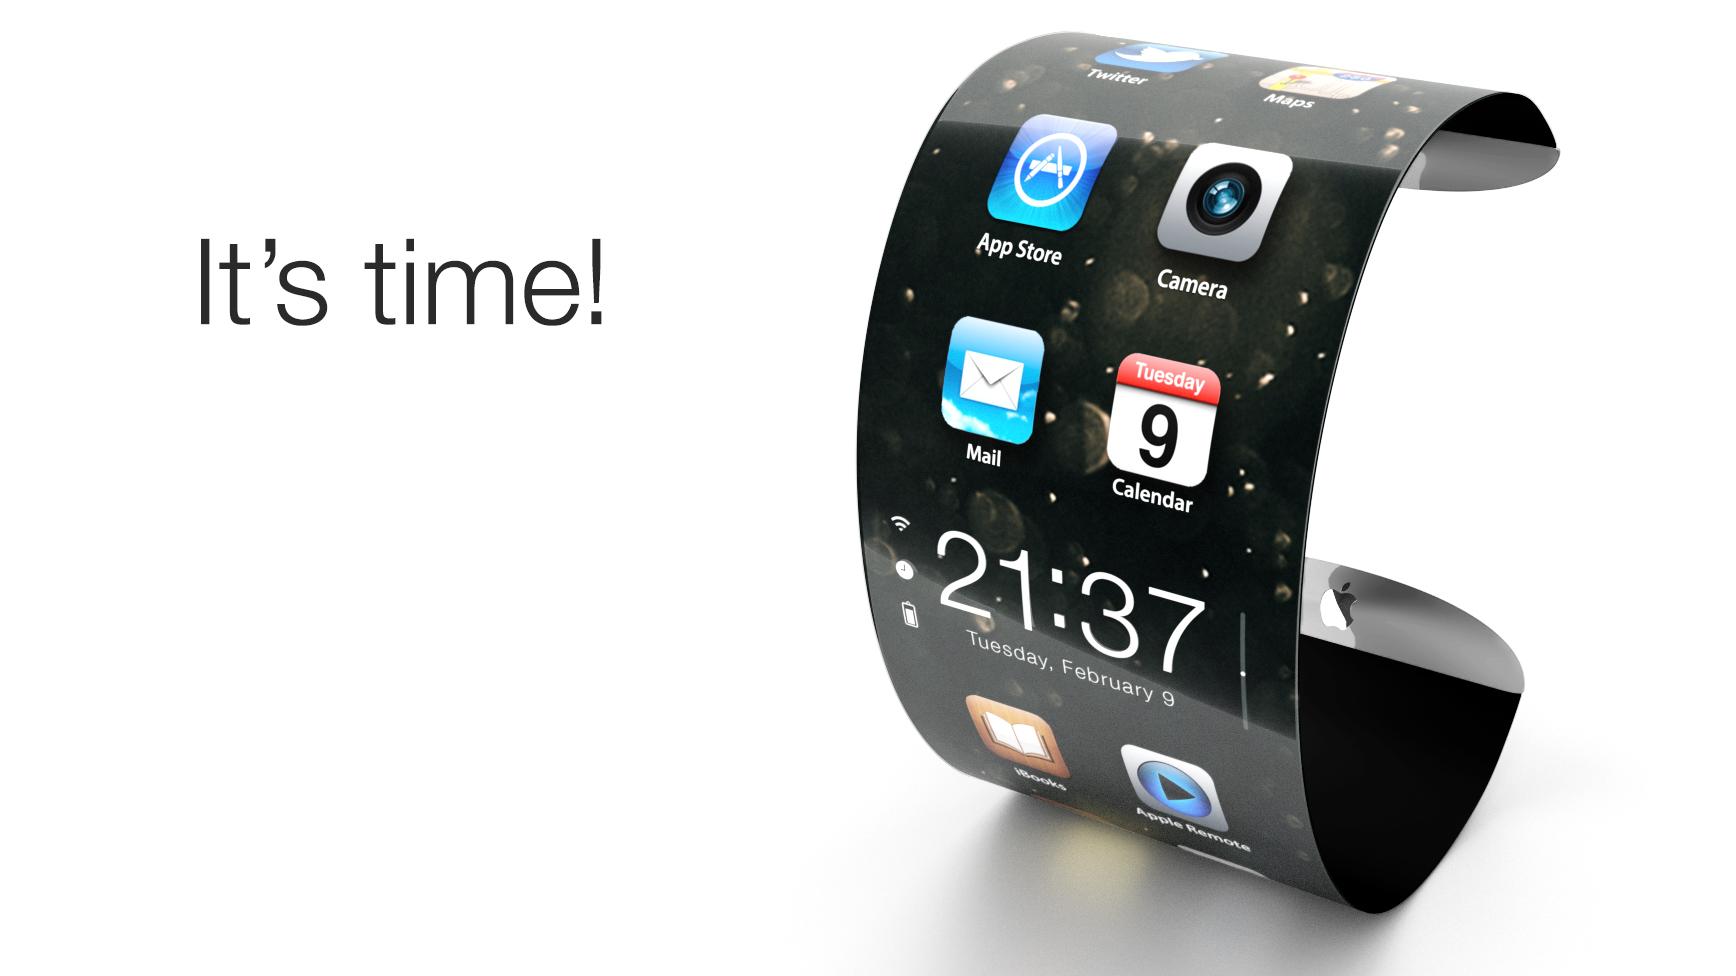 iWatch e iOS 8: insieme per una nuova piattaforma